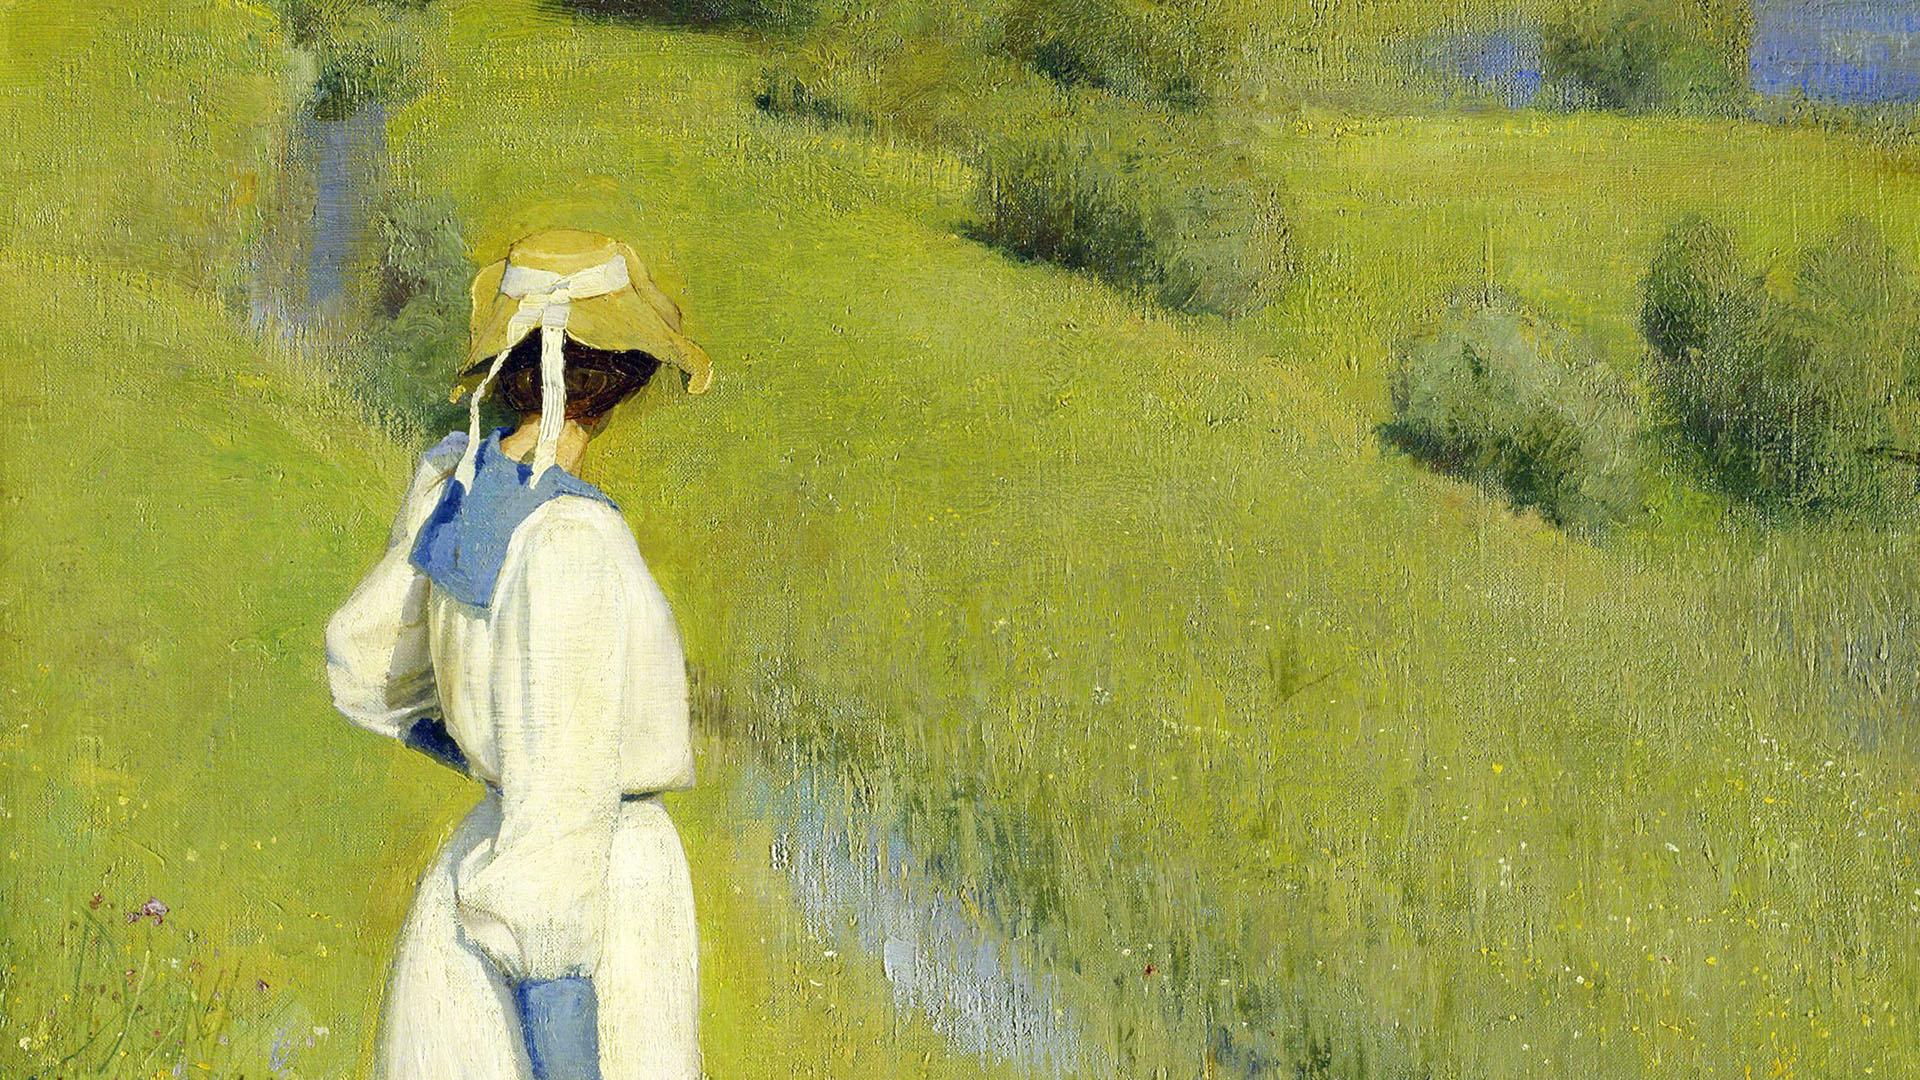 Richard Riemerschmid - In the Countryside 1920x1080